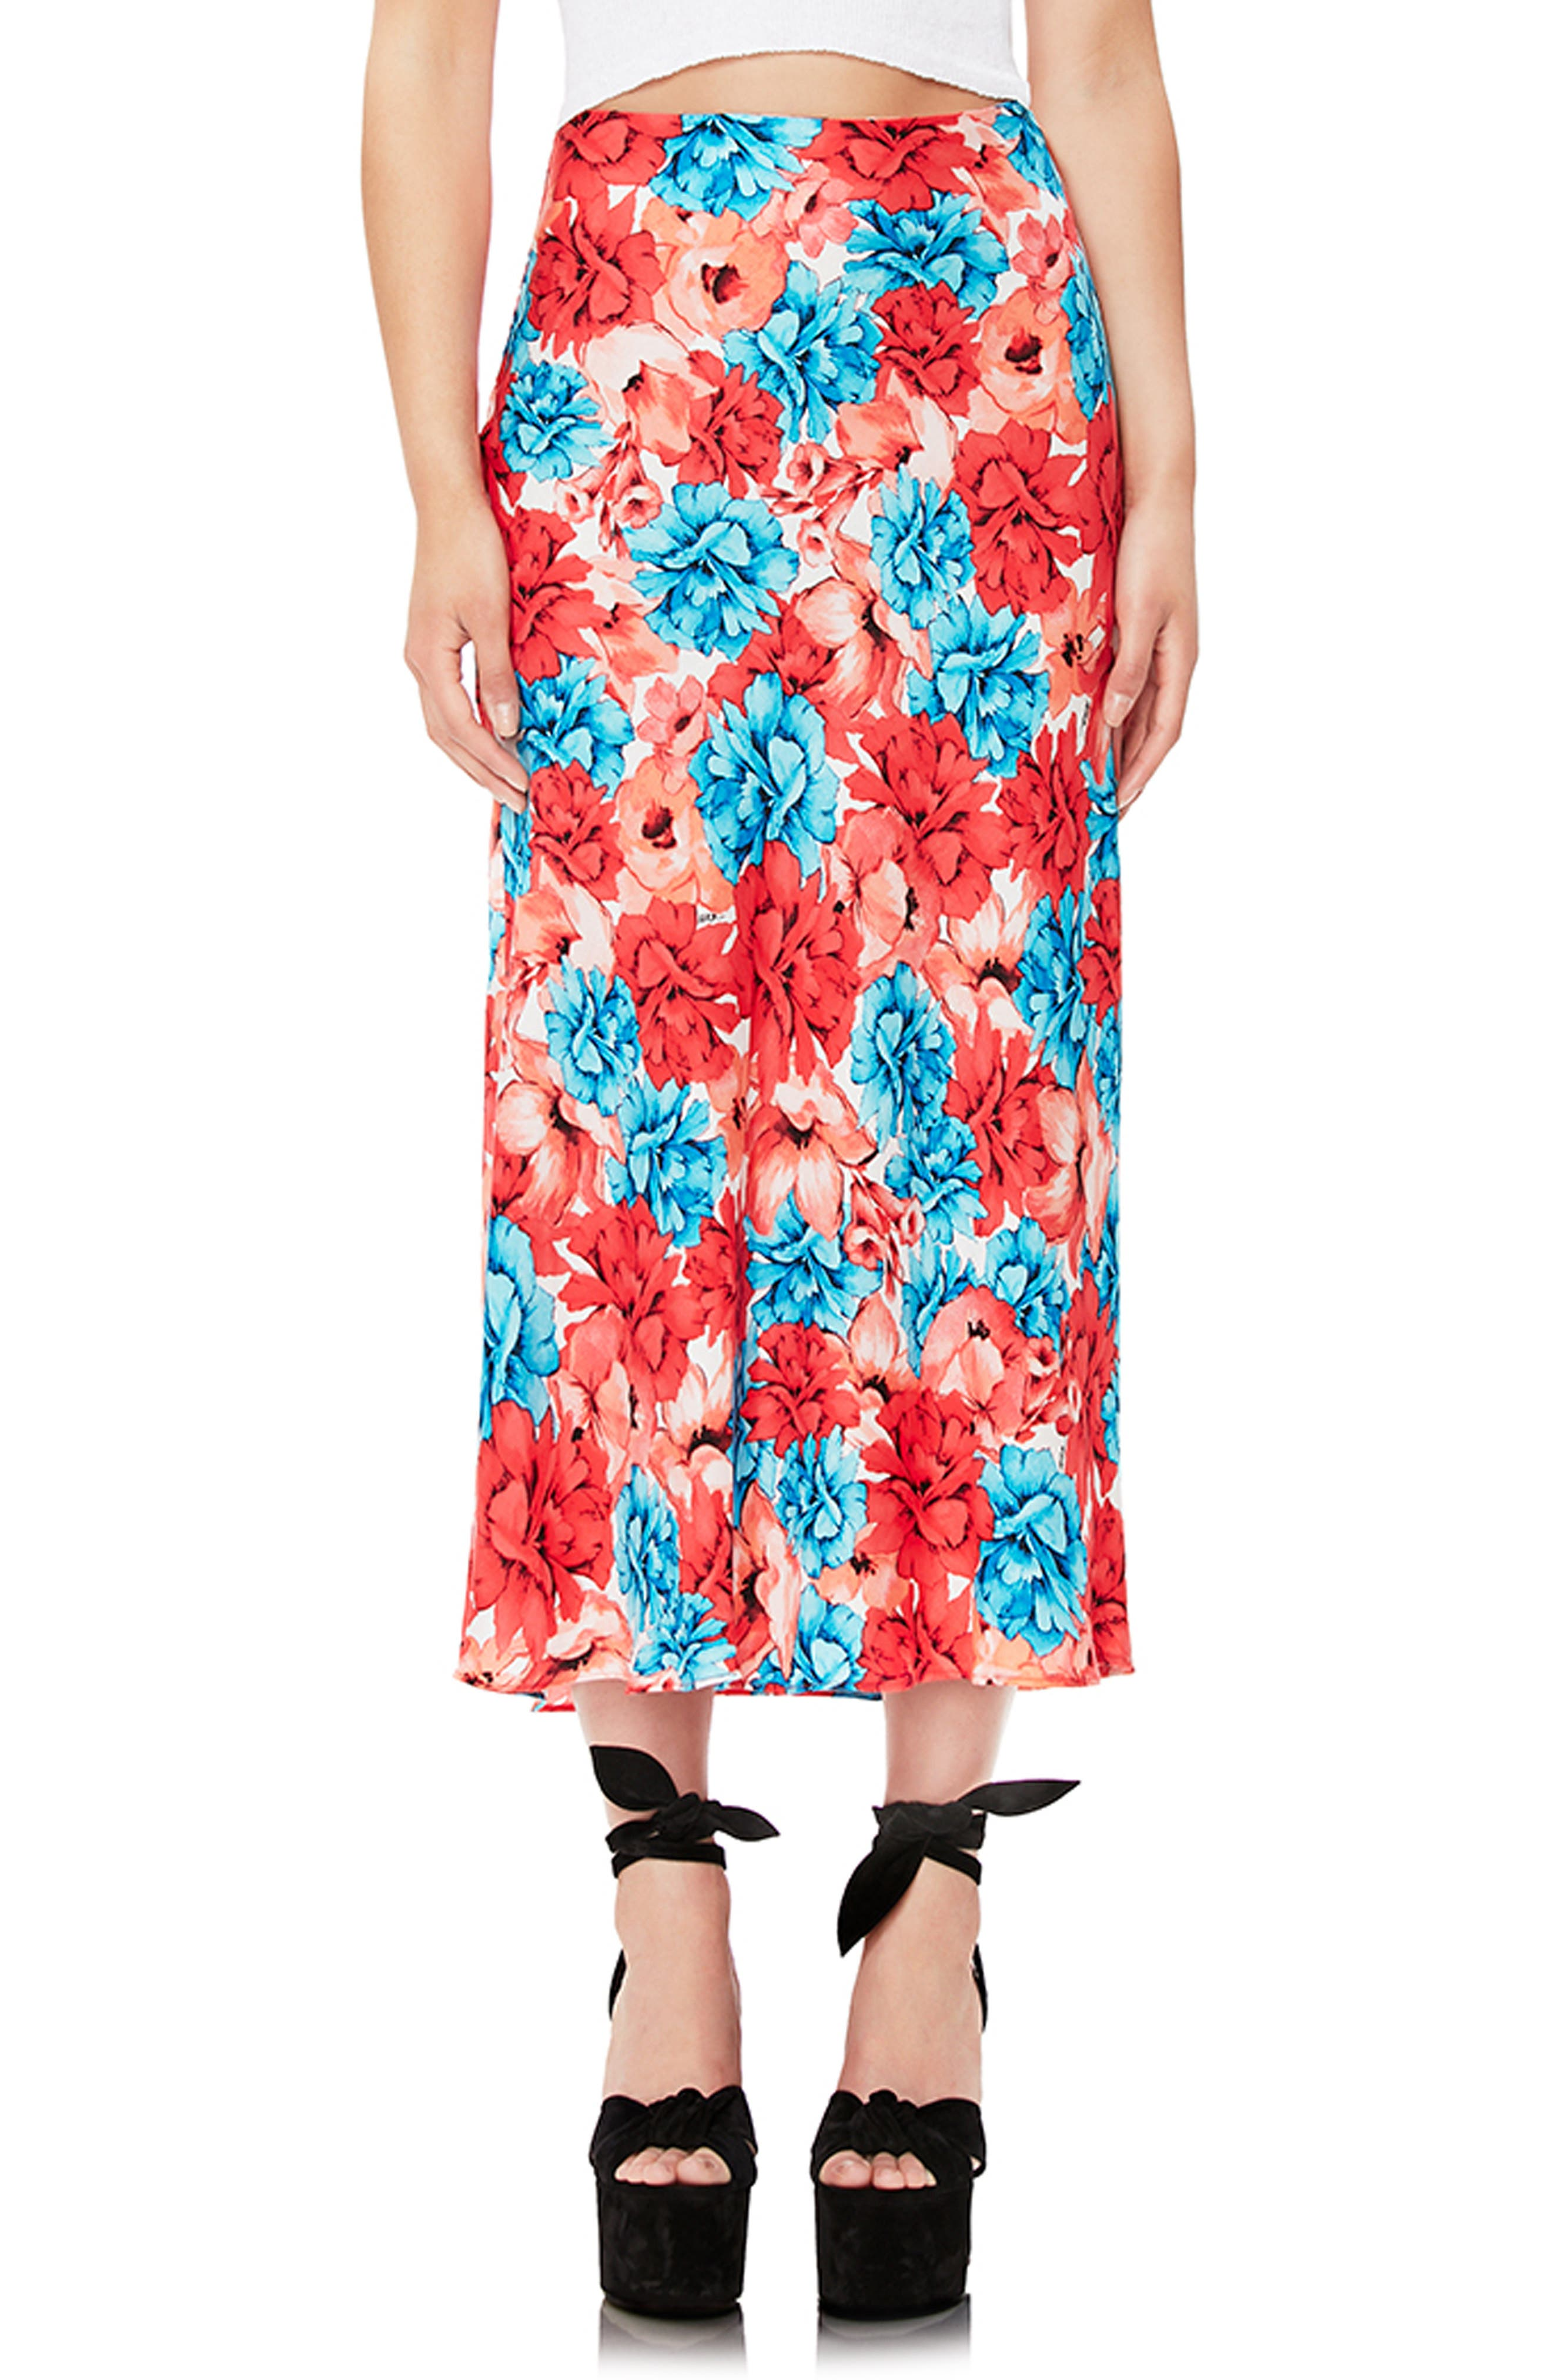 St Maternity John Dark Purple Knit Pencil Skirt** Us 6 Fancy Colours